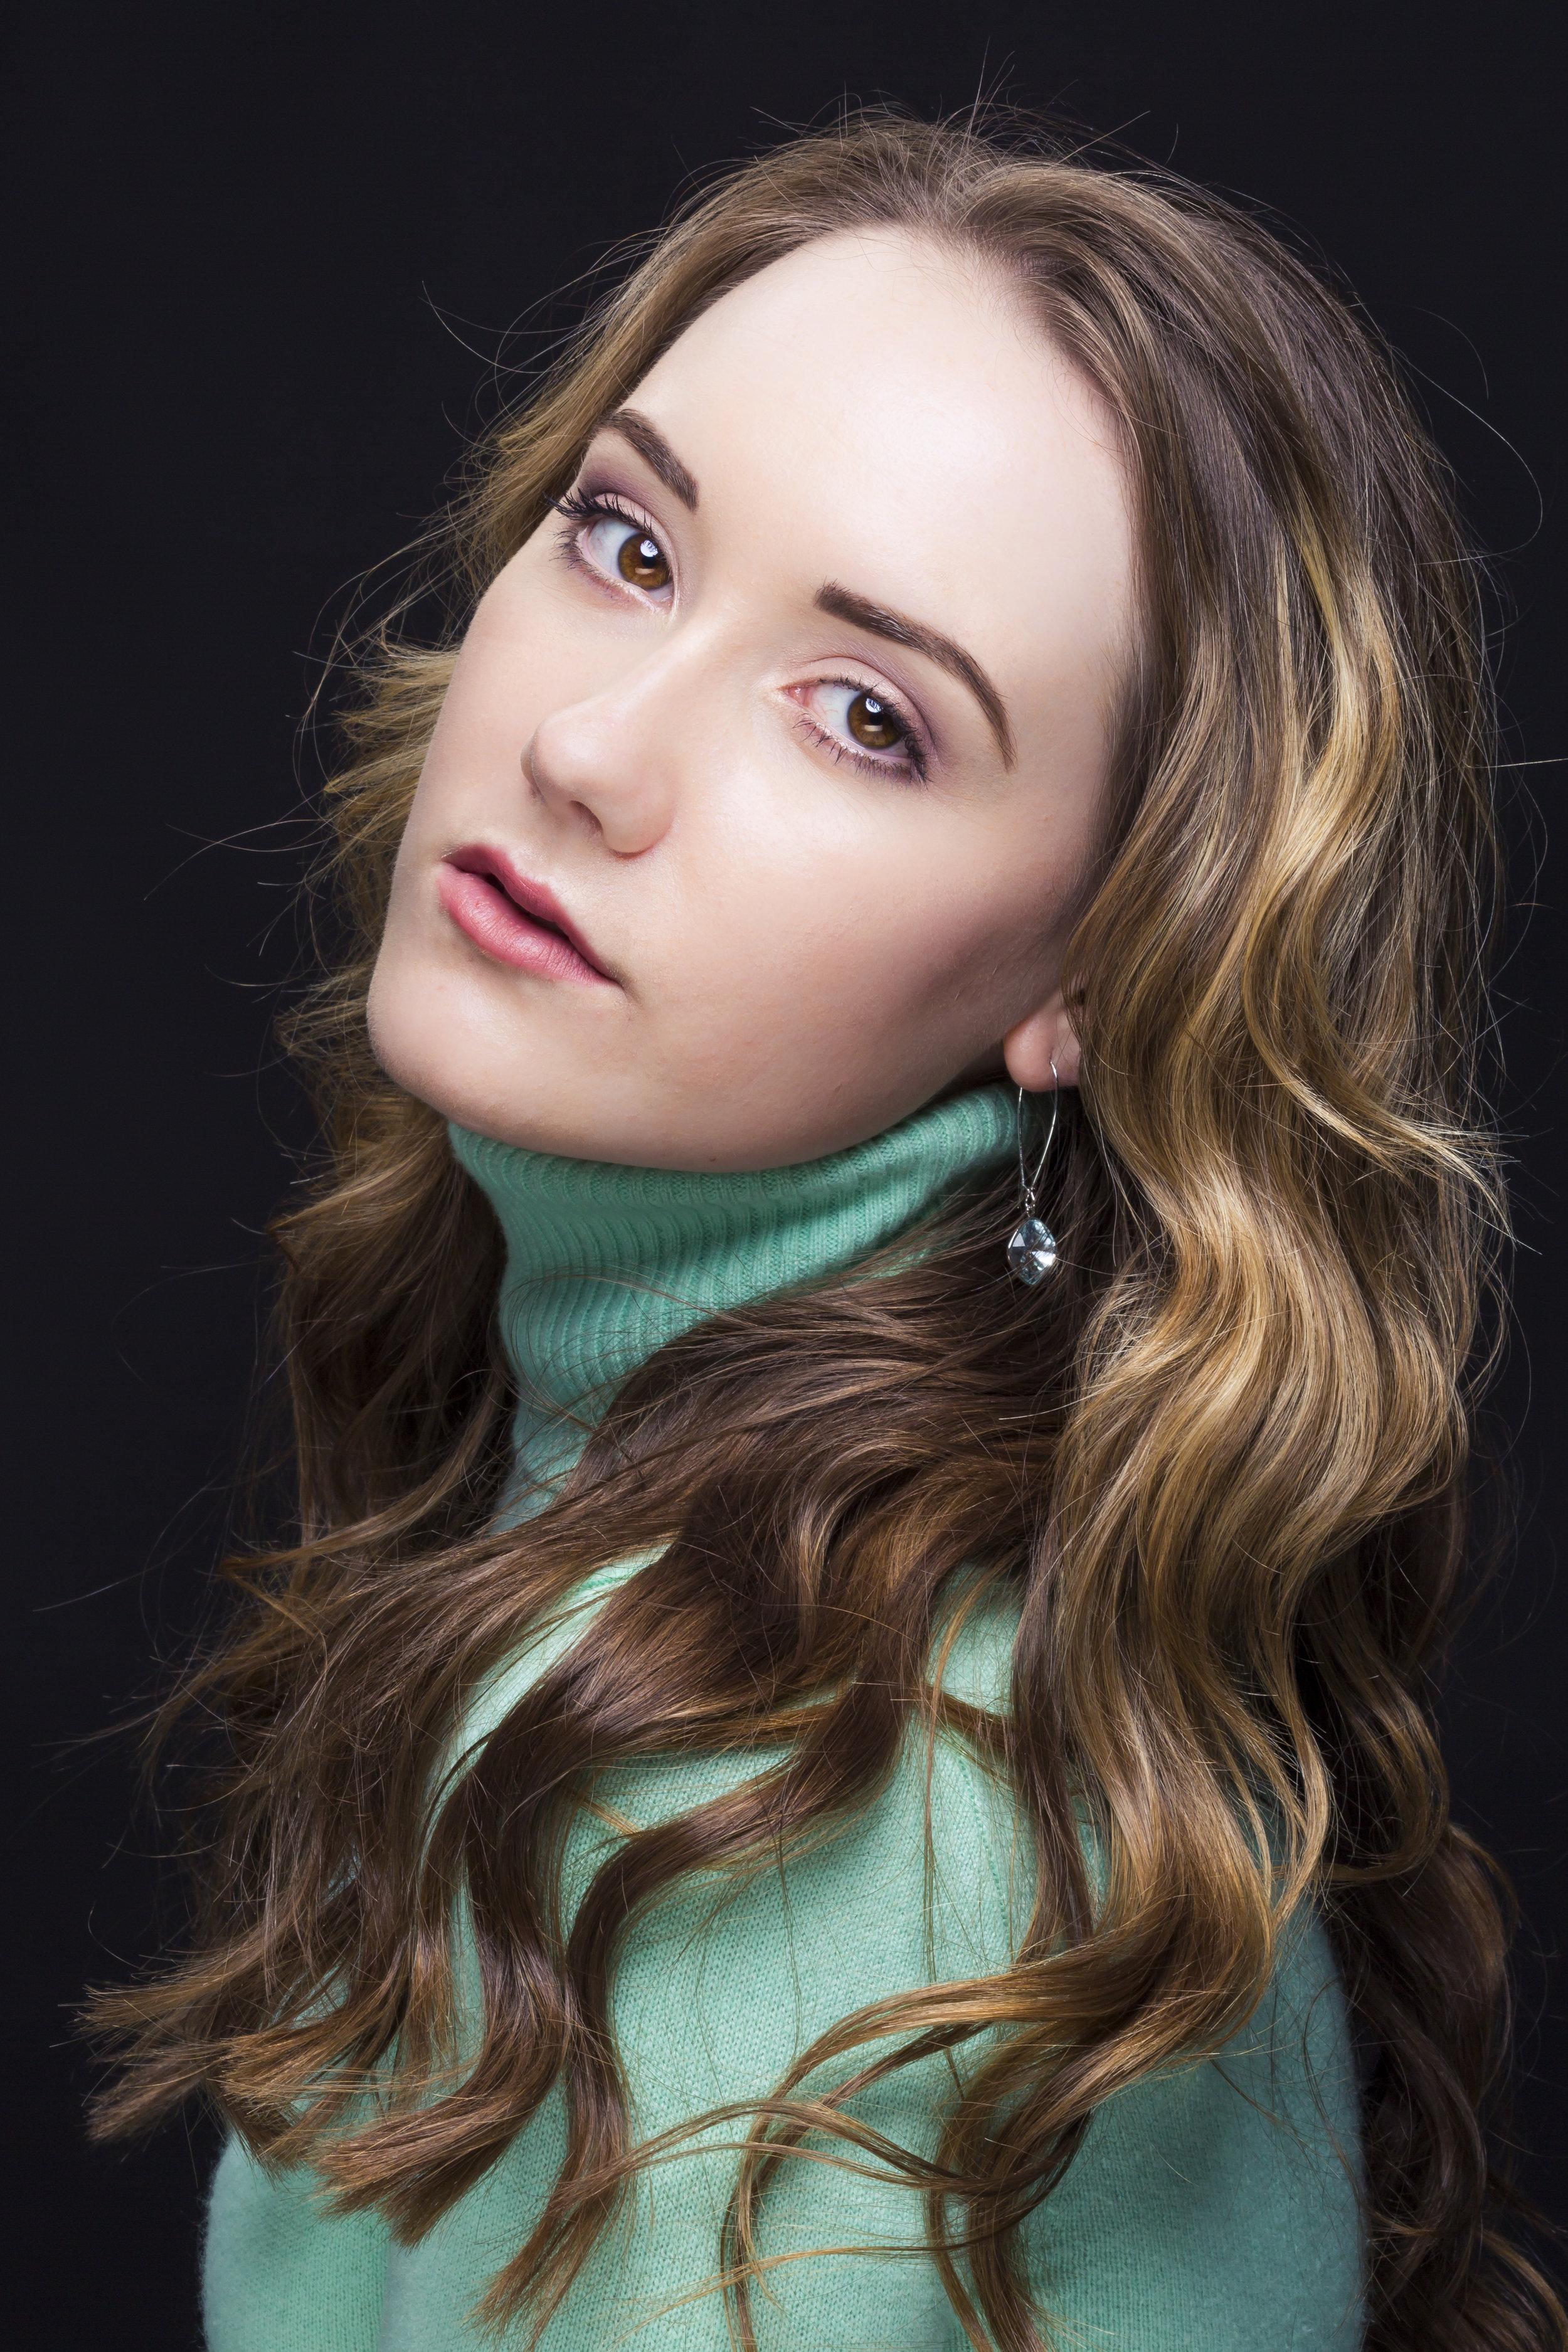 Paige-Clamshell-Lightin-Edits-HQ-4.jpg